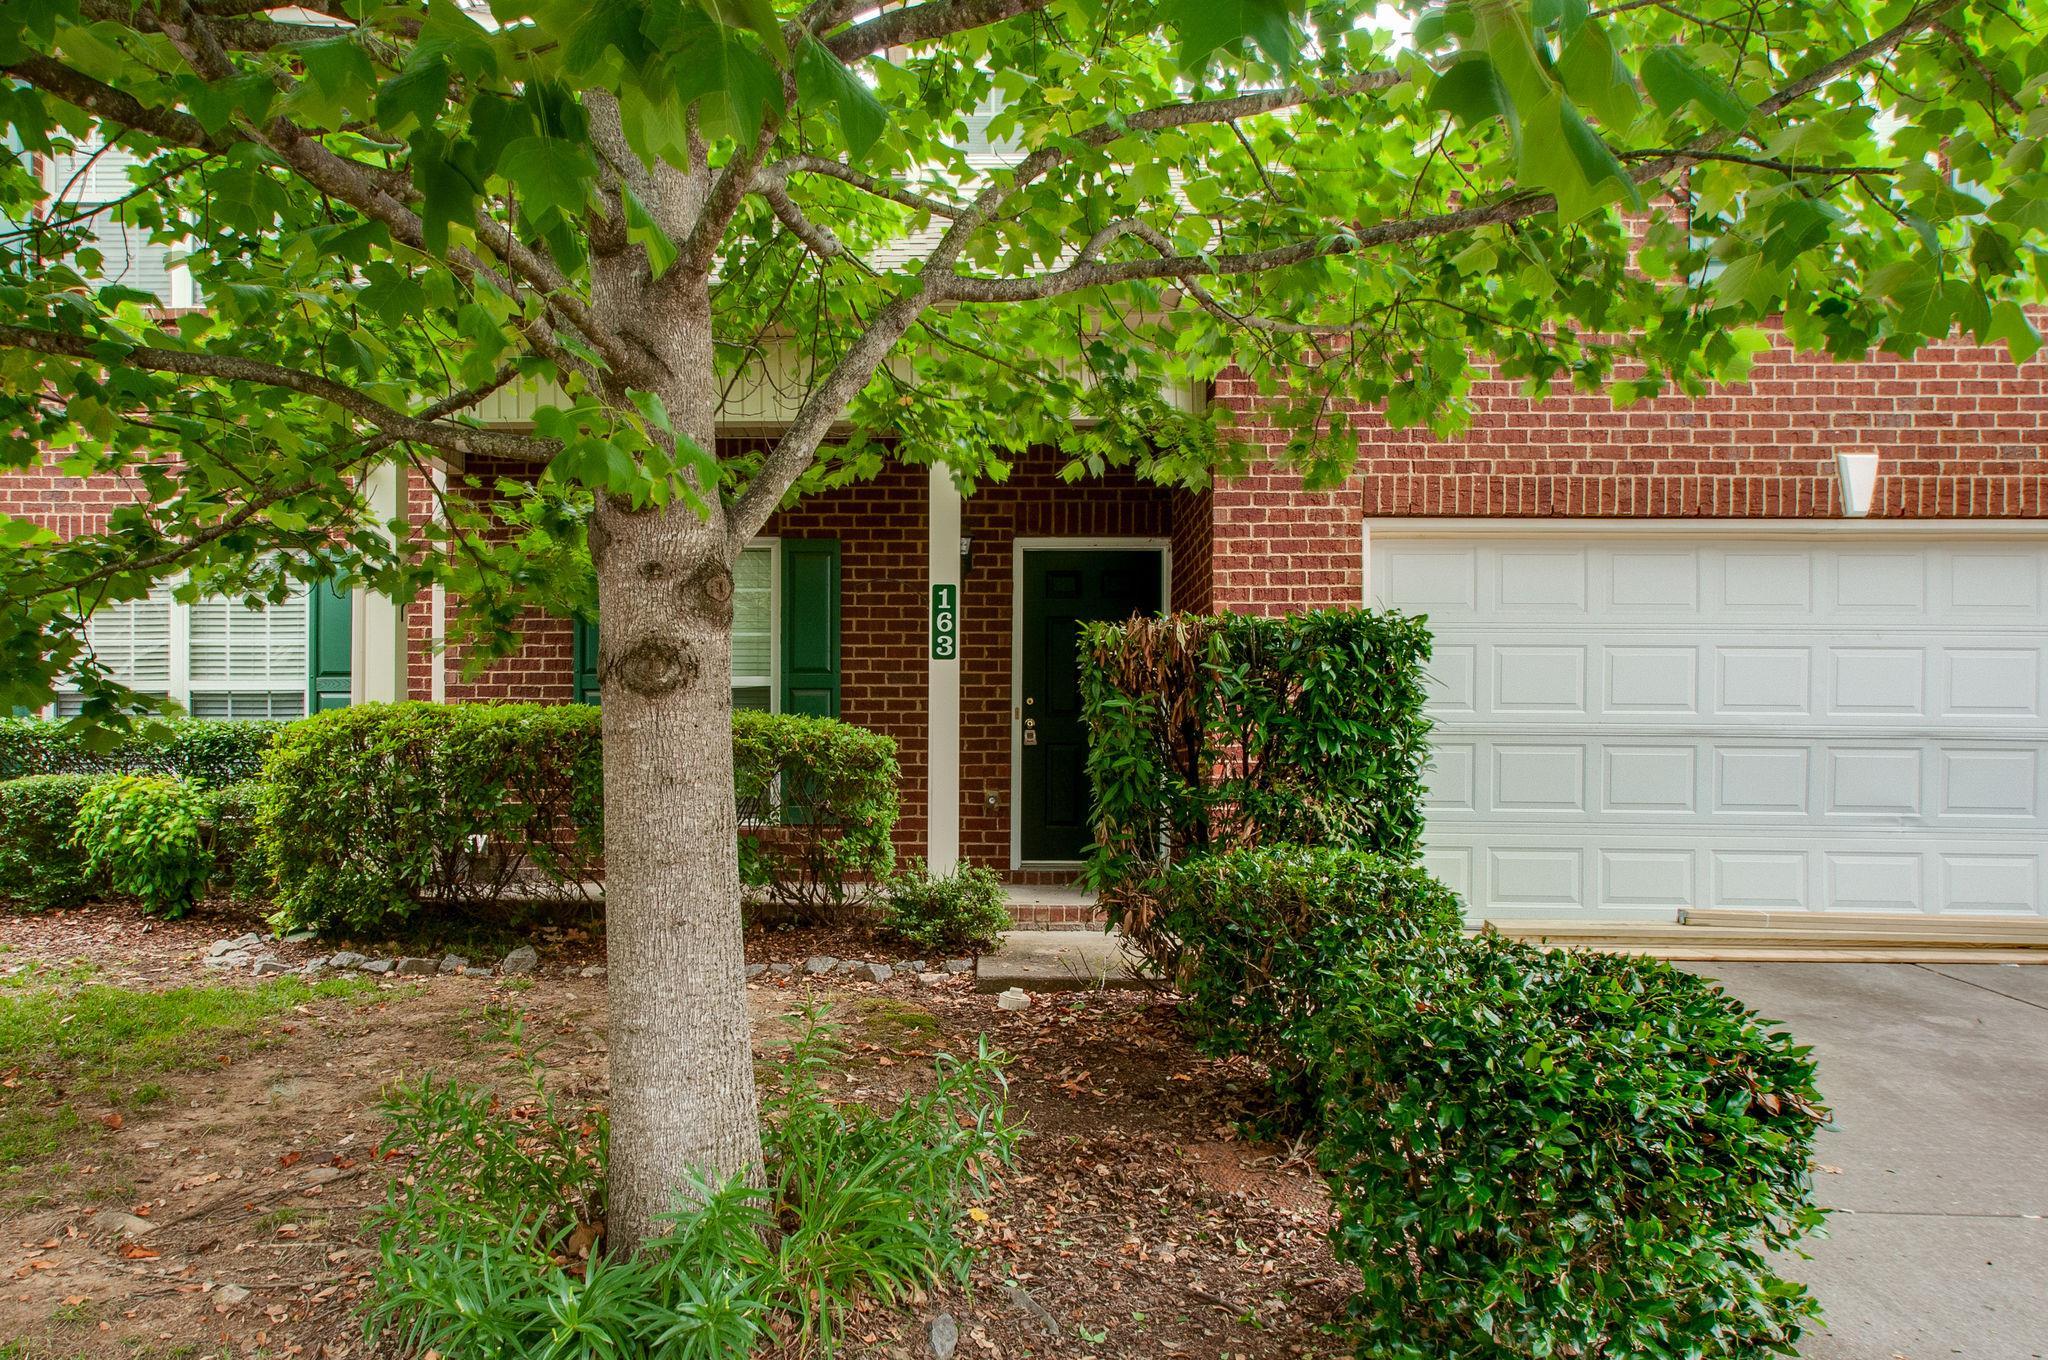 163 Nashboro Grns, Nashville, TN 37217 - Nashville, TN real estate listing